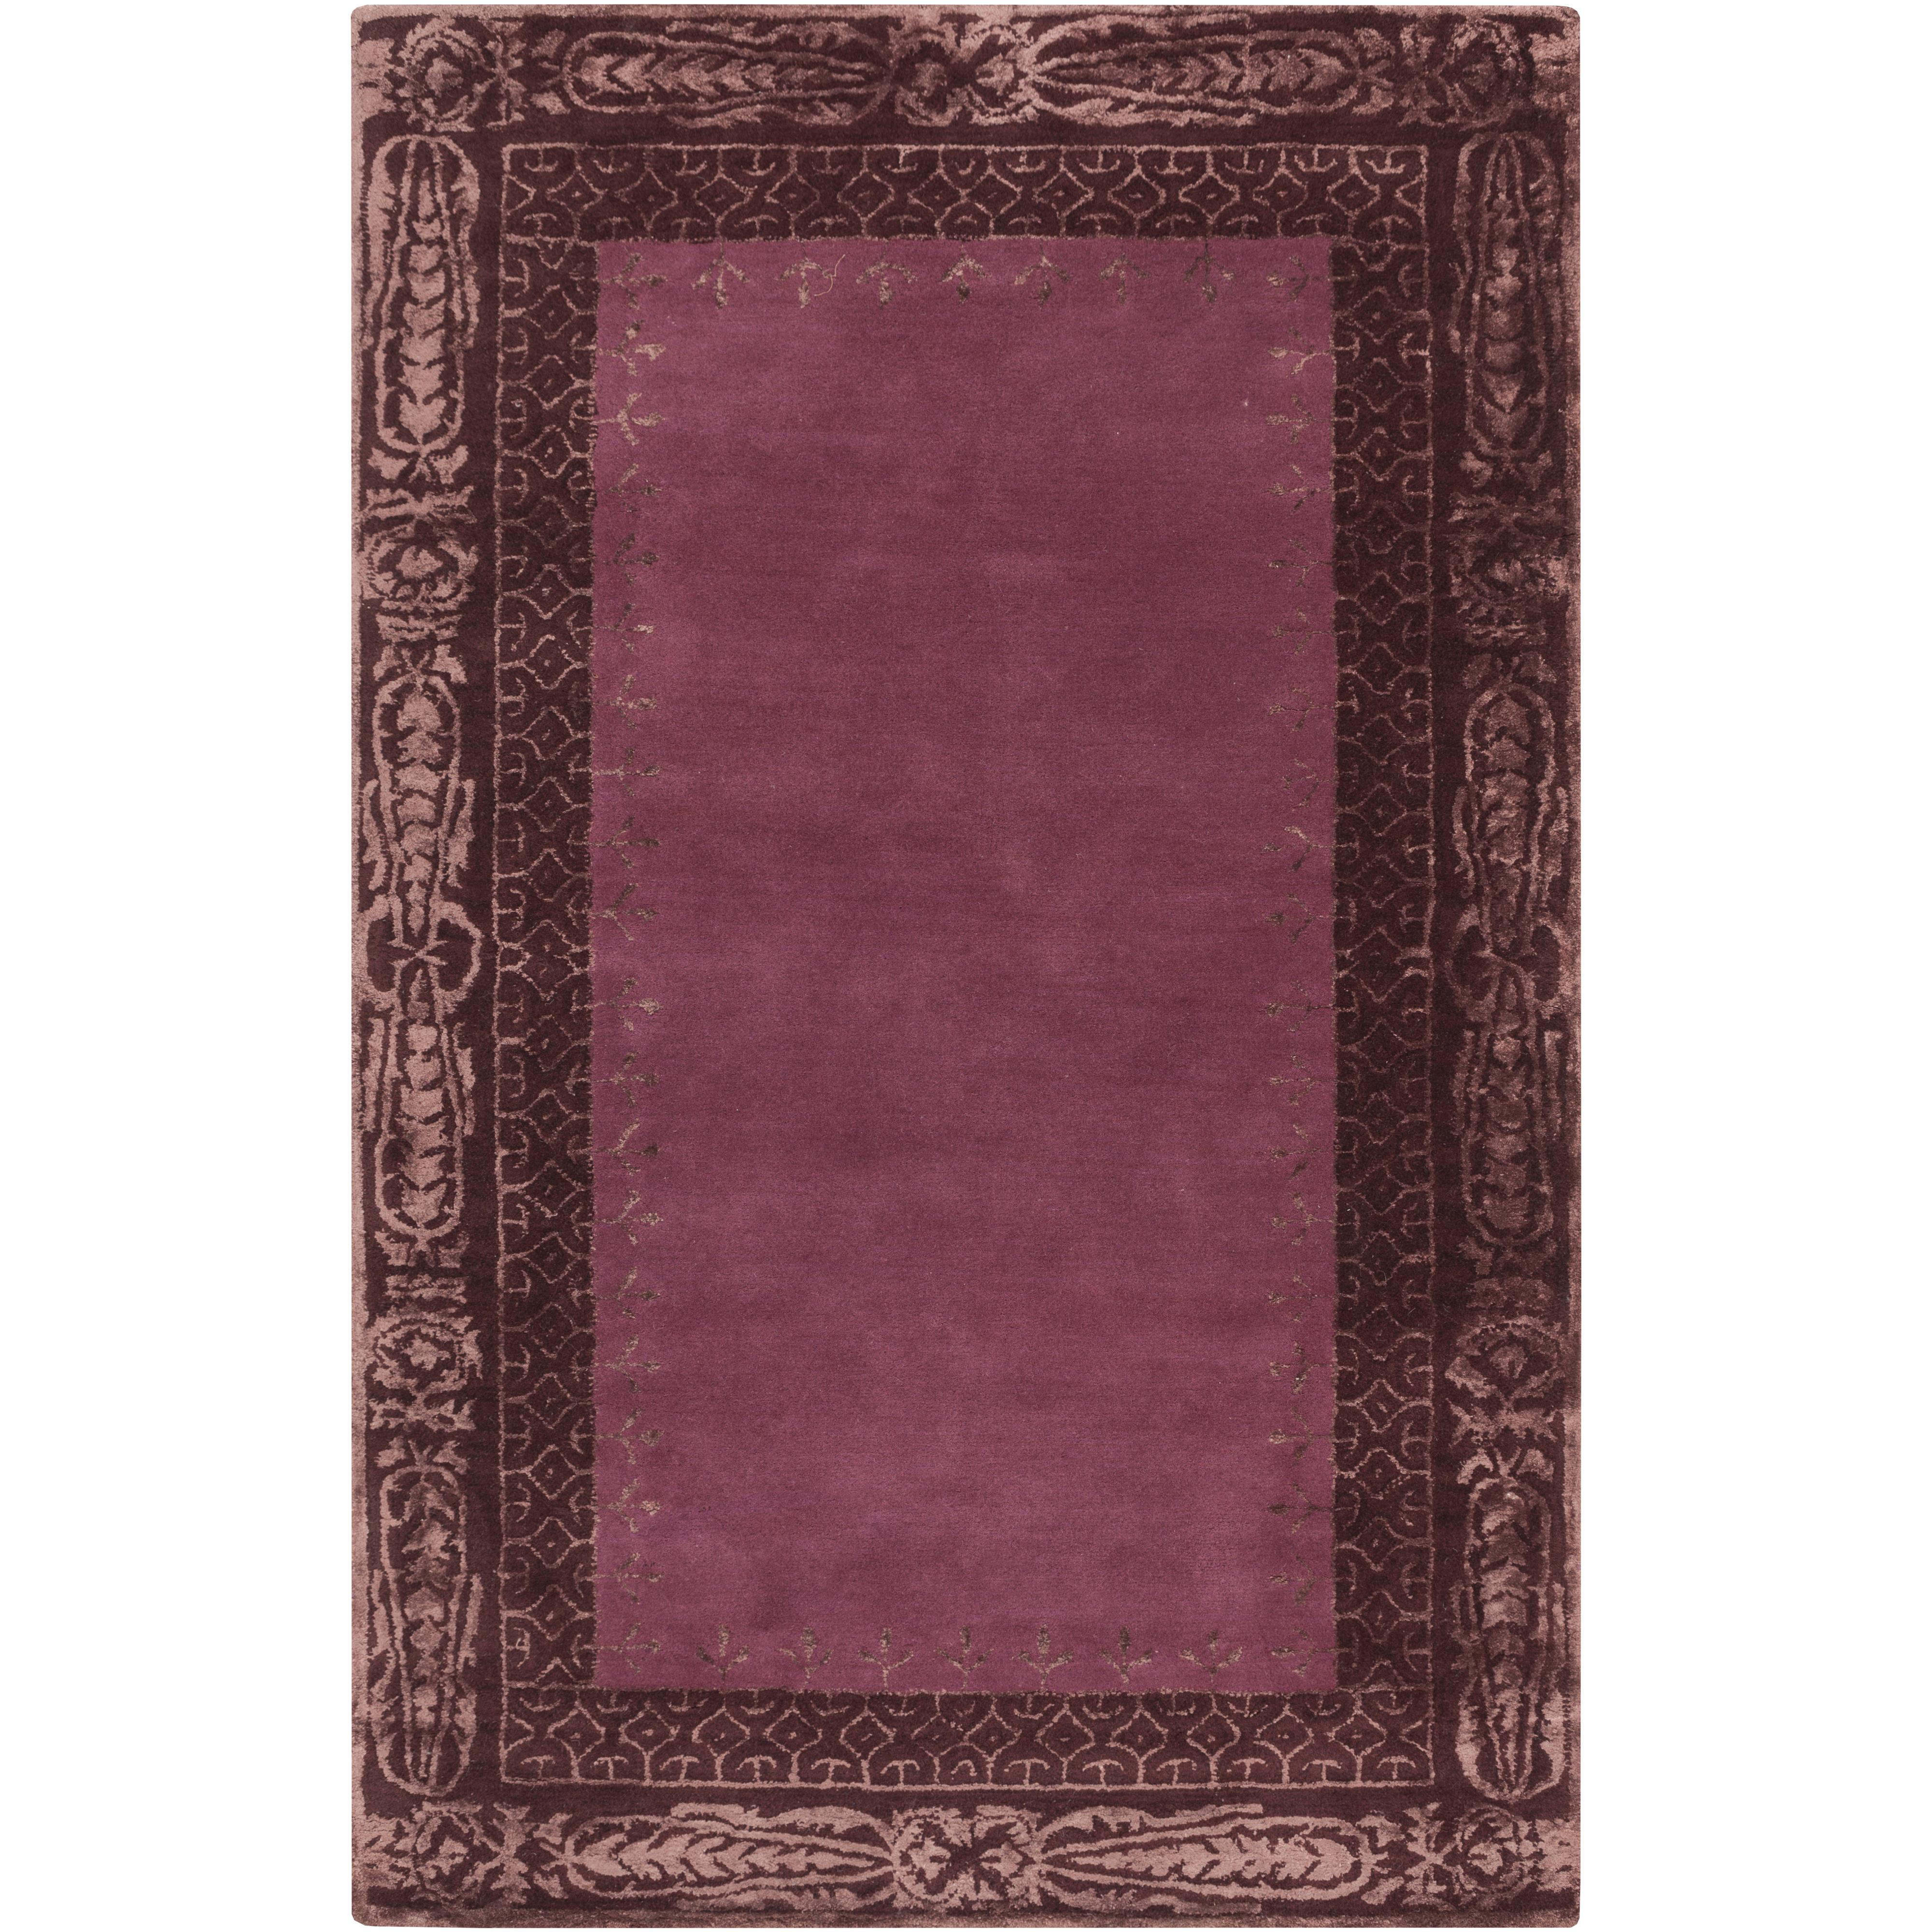 Surya Rugs Henna 8' x 11' - Item Number: HEN1008-811